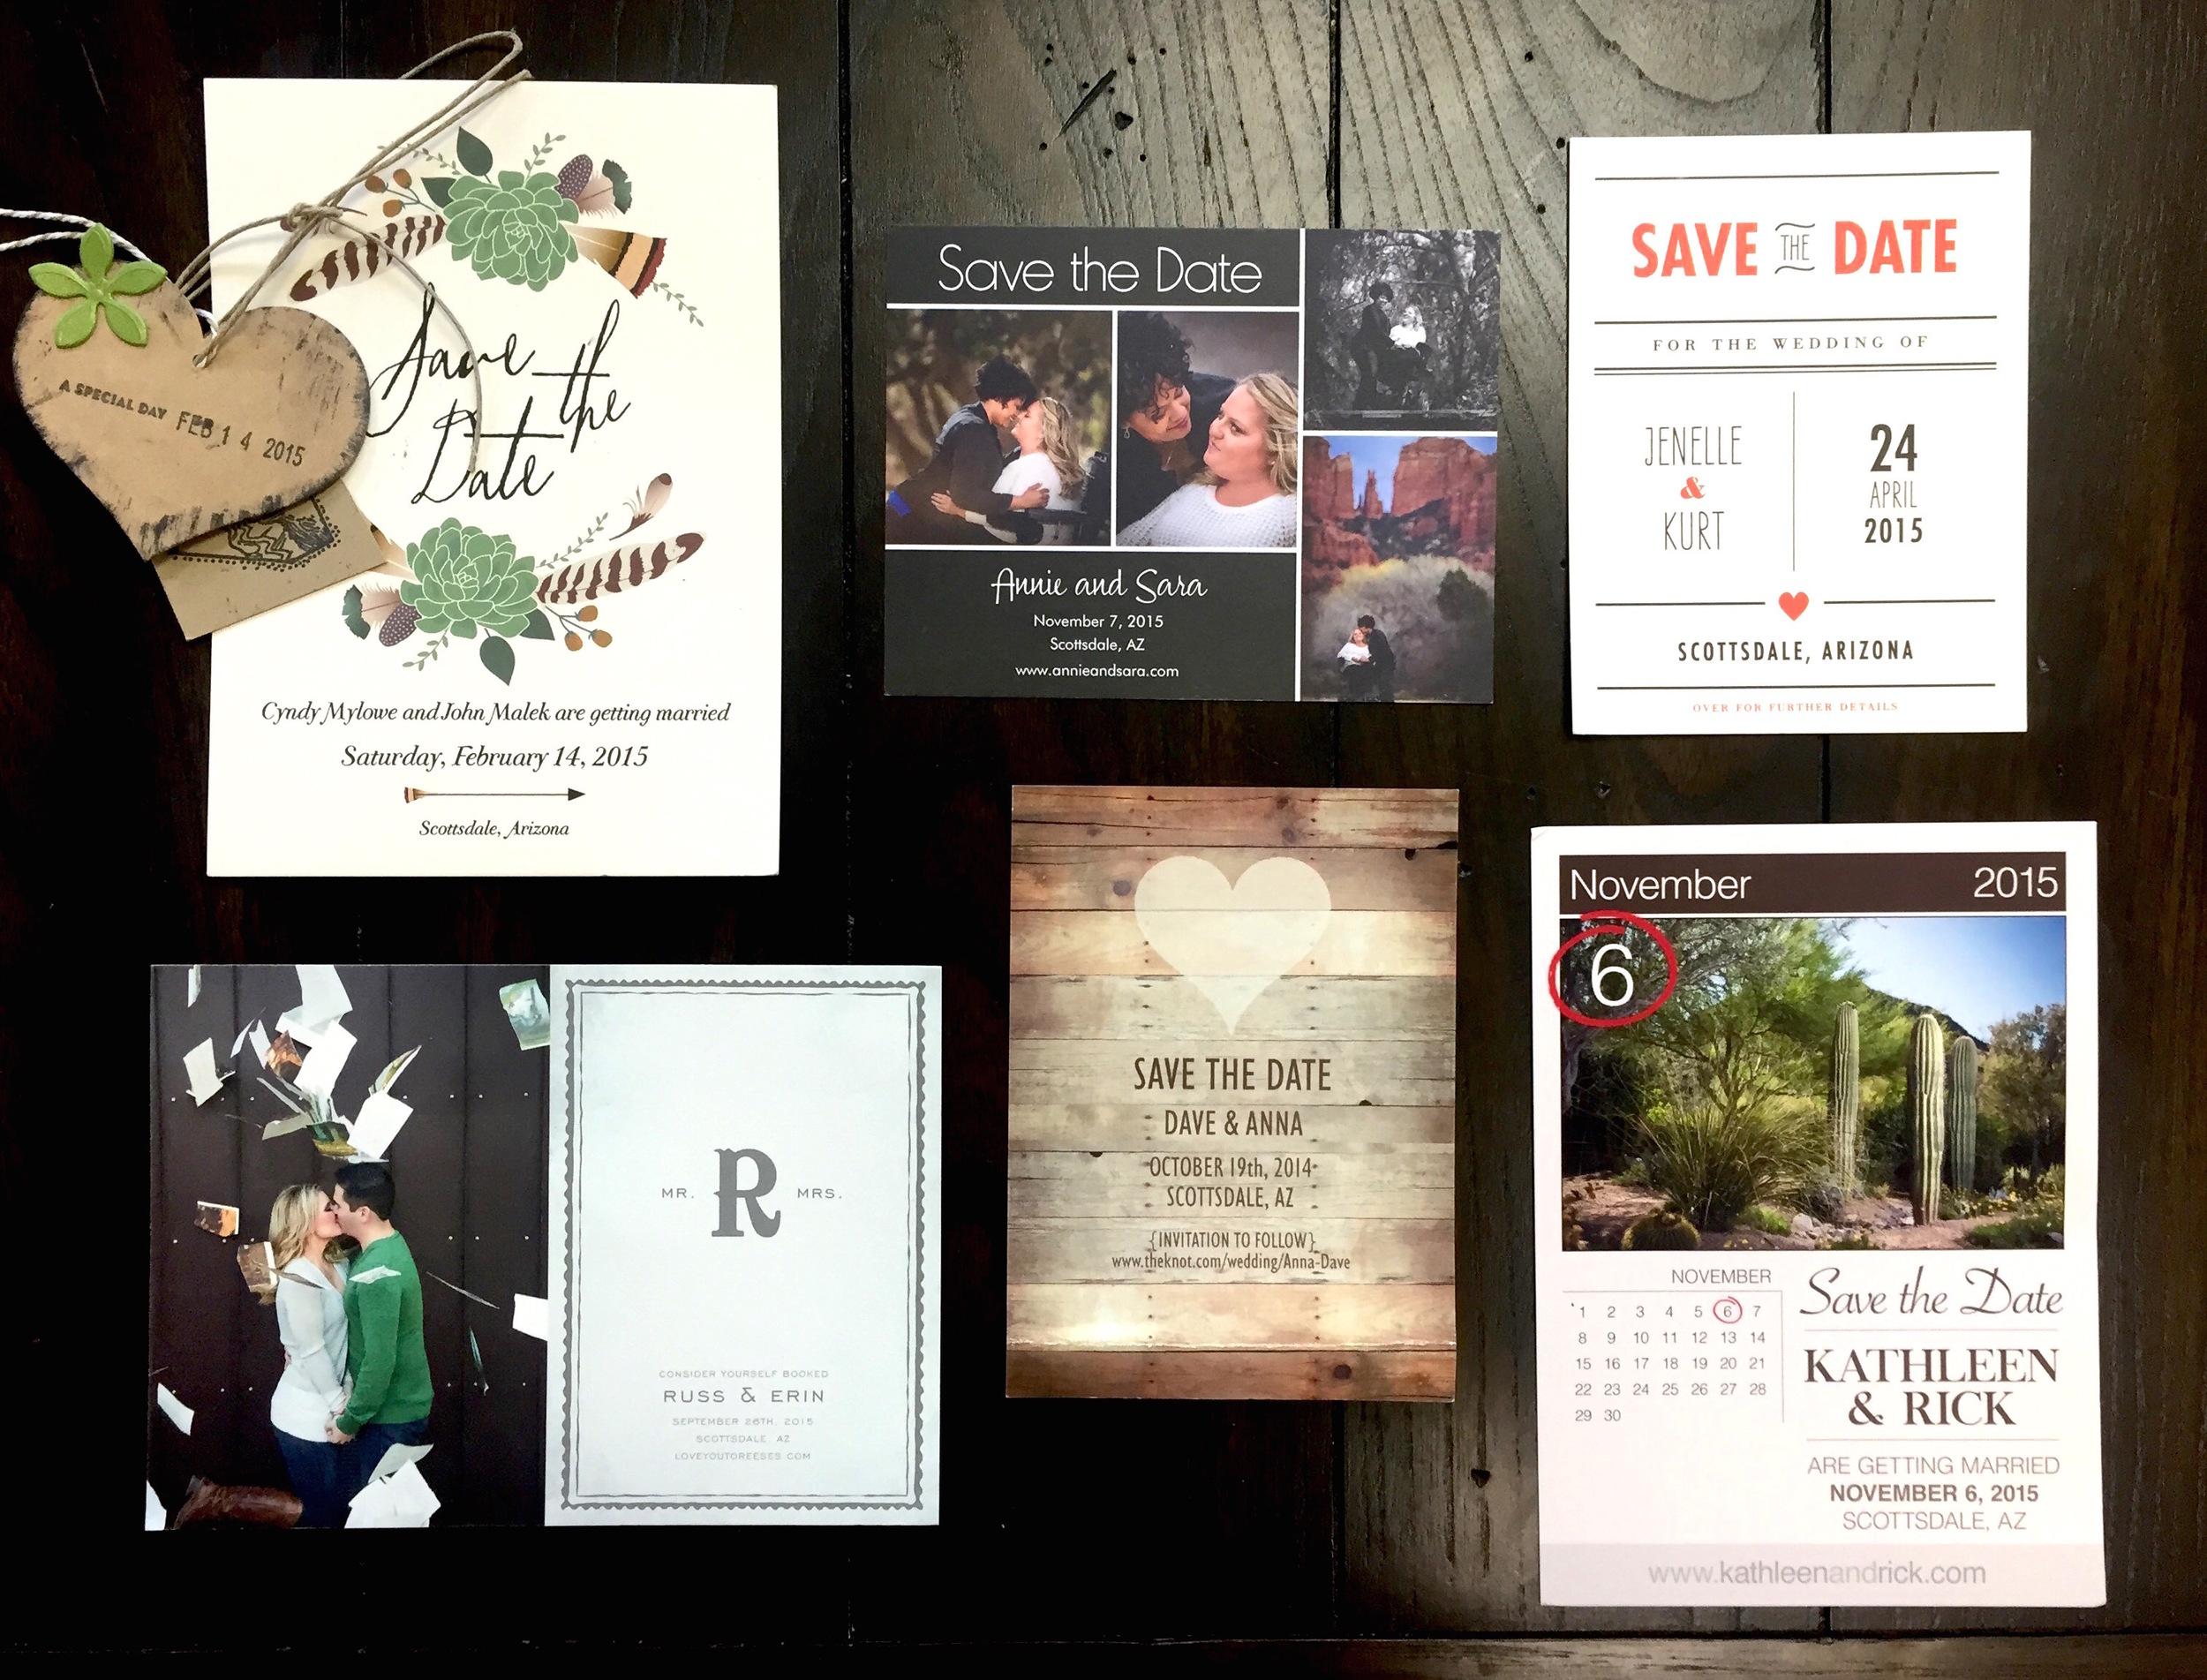 Scottsdale and Phoenix Wedding Save-the-Dates